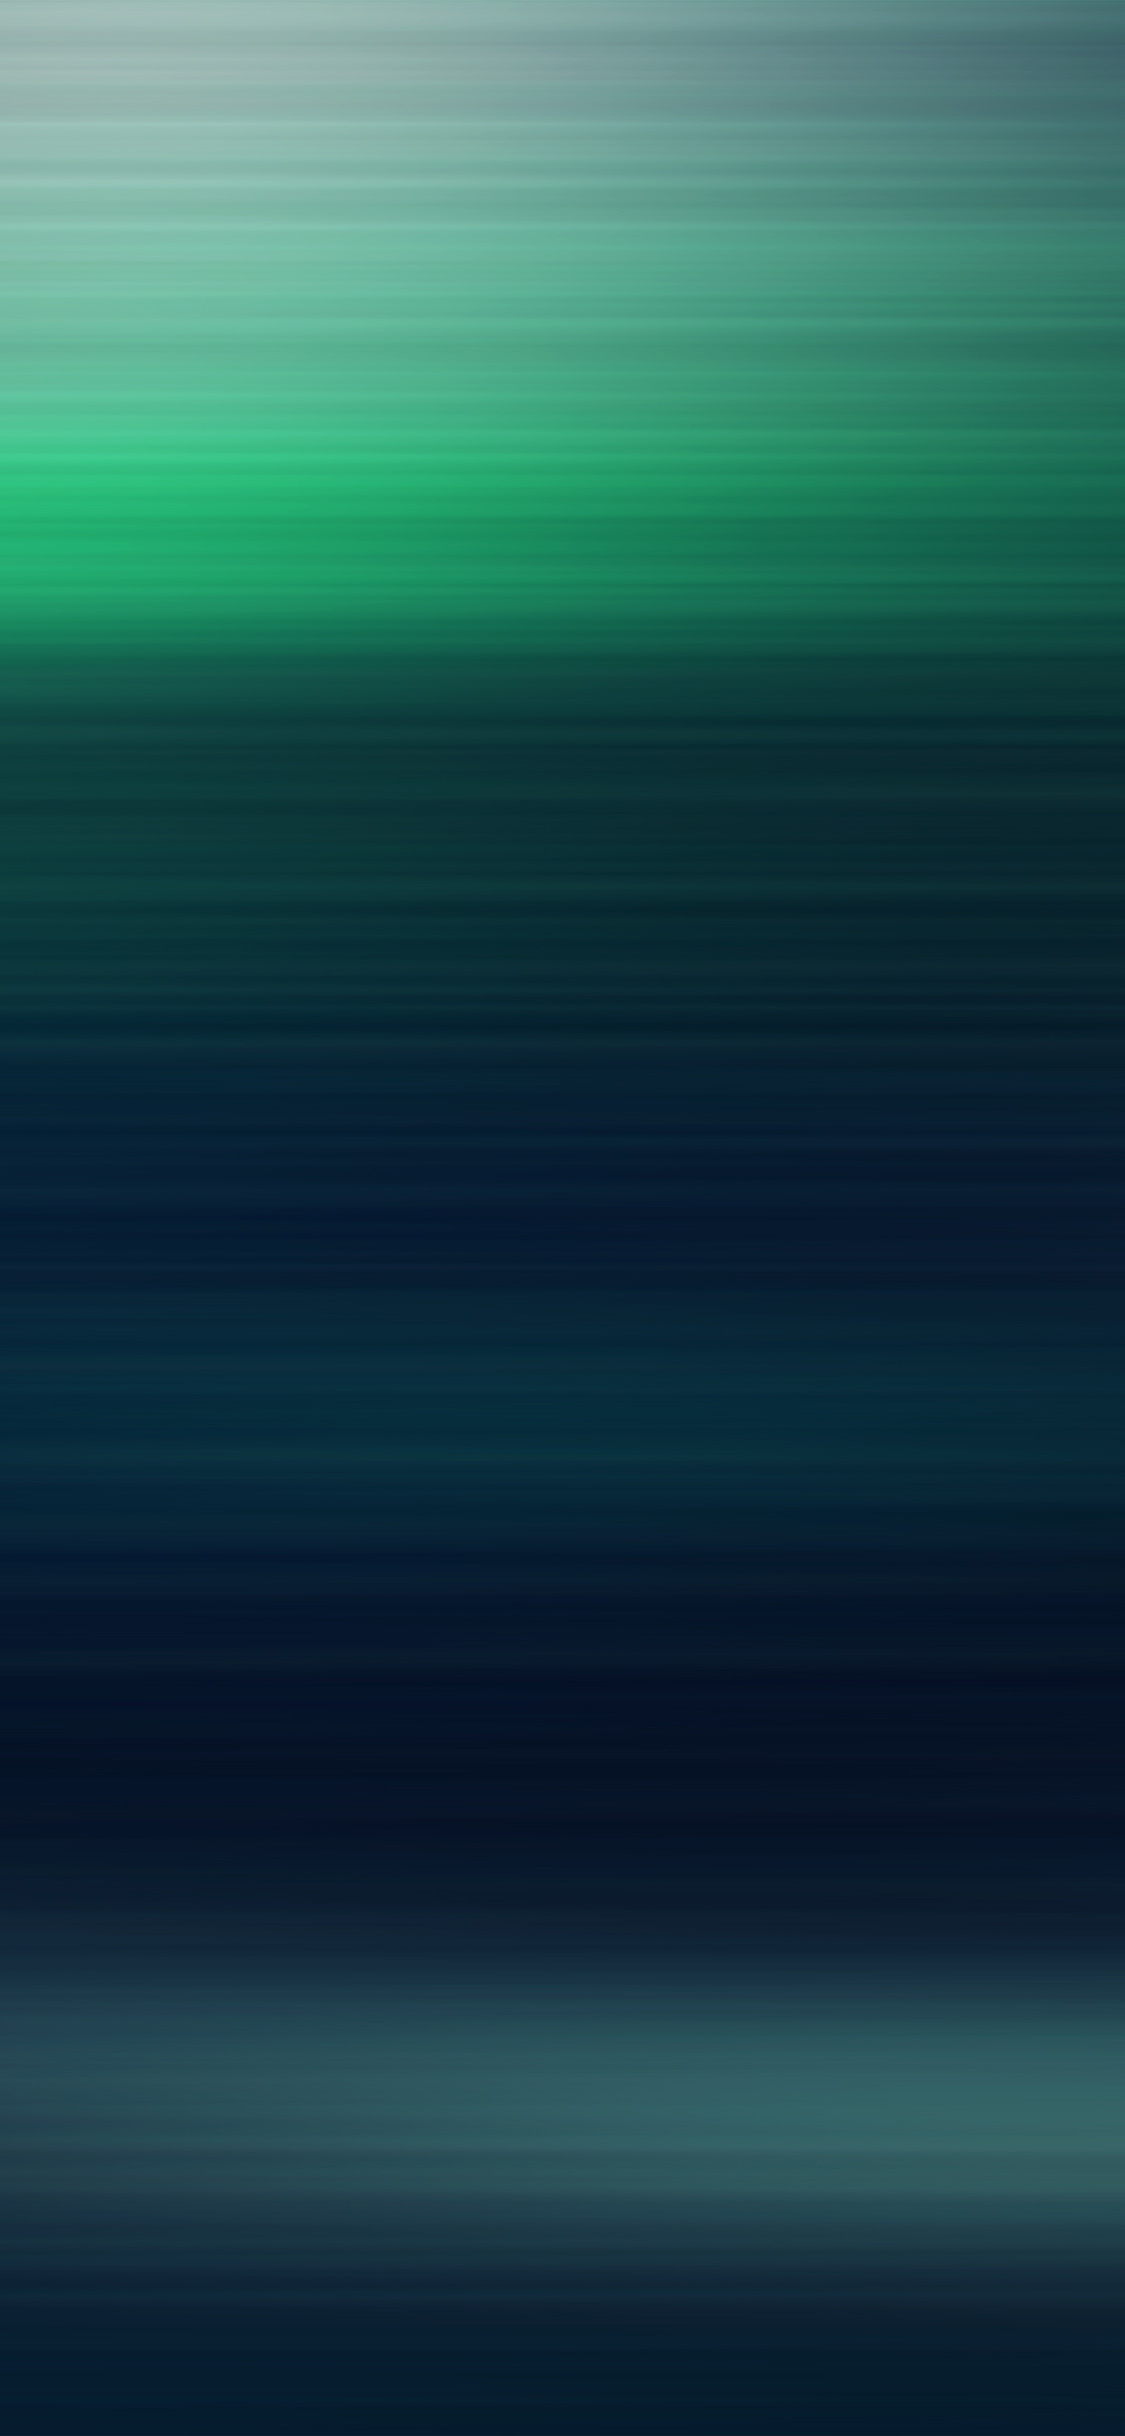 iPhoneXpapers.com-Apple-iPhone-wallpaper-si24-green-blue-motion-gradation-blur